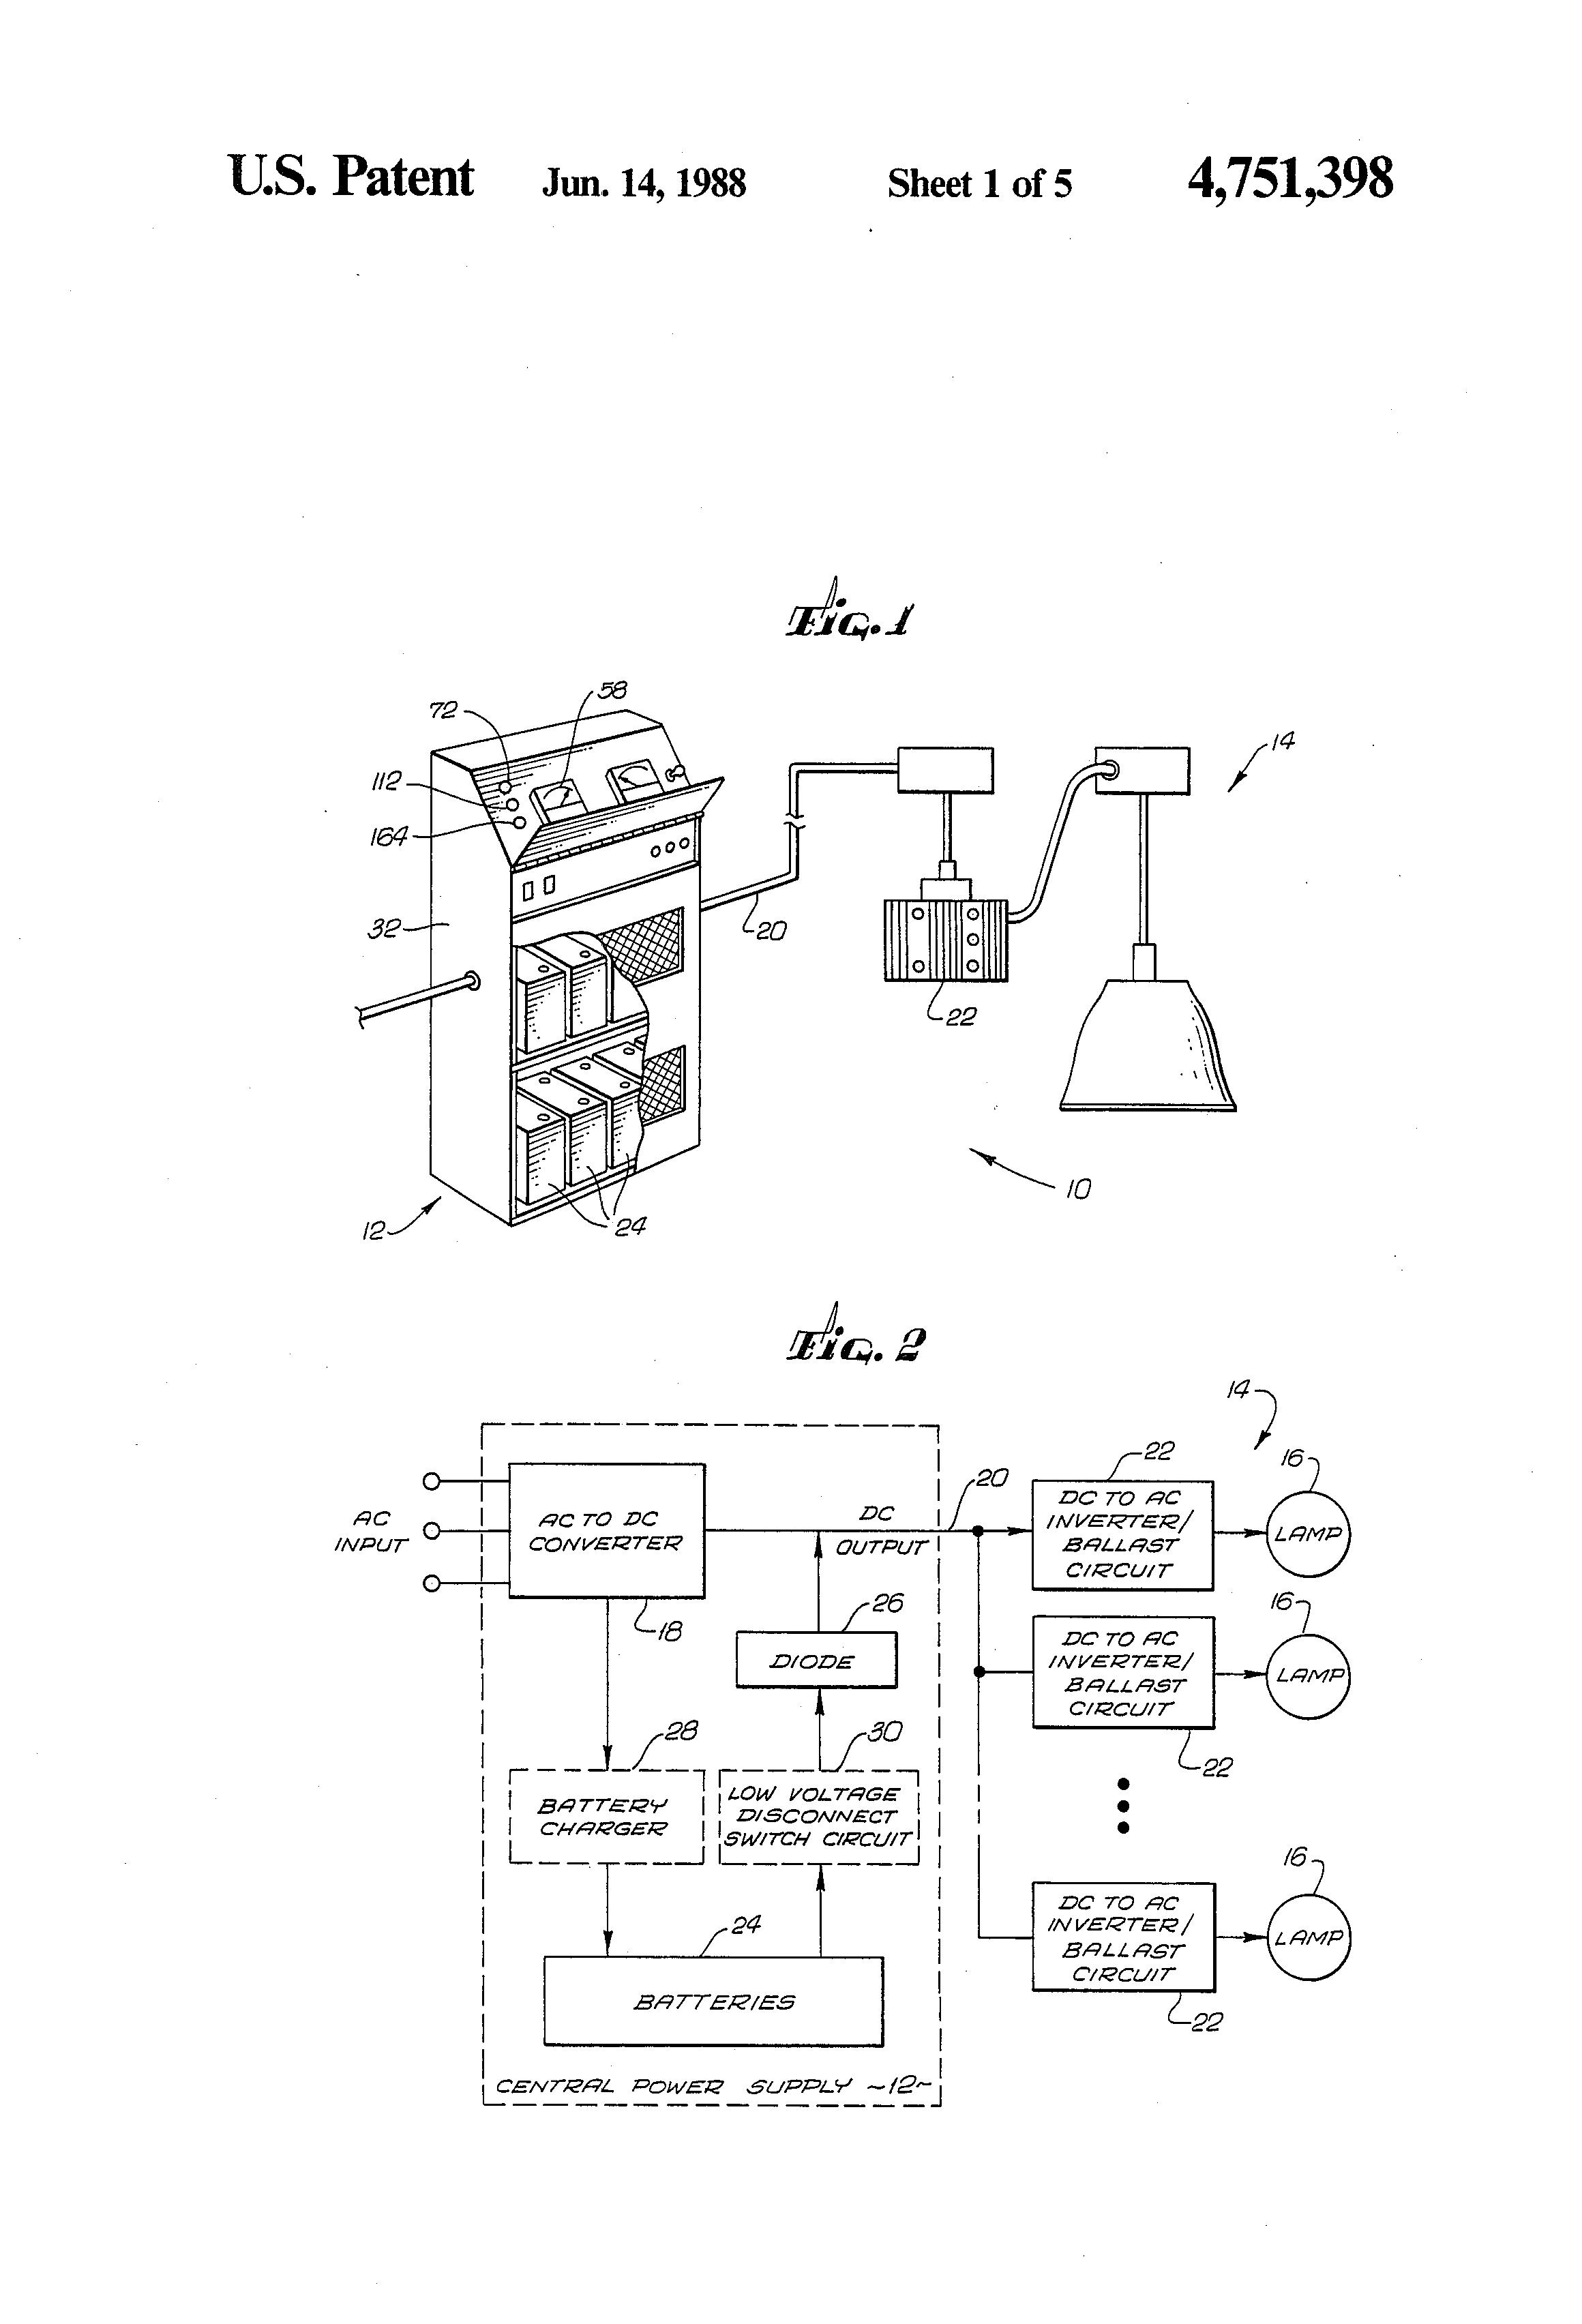 Bodine Electric Company Nsh-34rh Wiring Diagram on